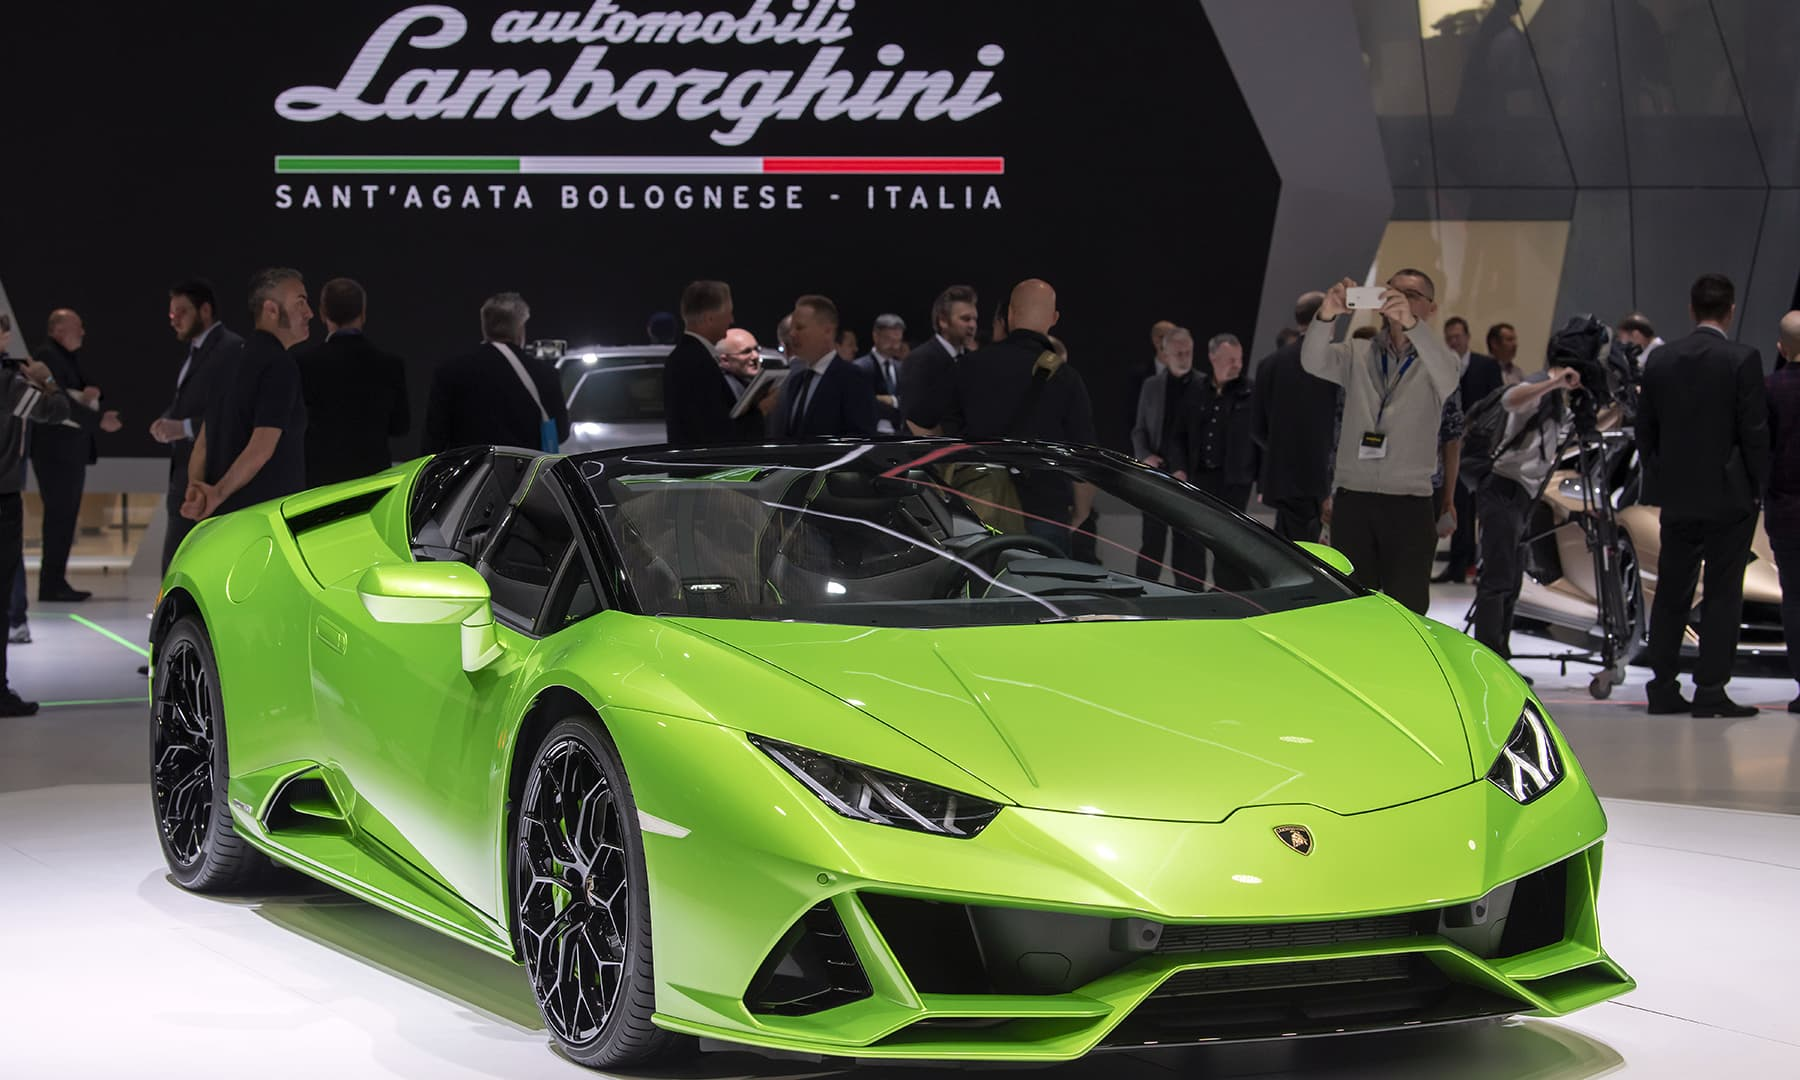 The Lamborghini Huracan EVO Spyder is presented during the press day at the 89th Geneva International Motor Show'in Geneva, Switzerland. — AP